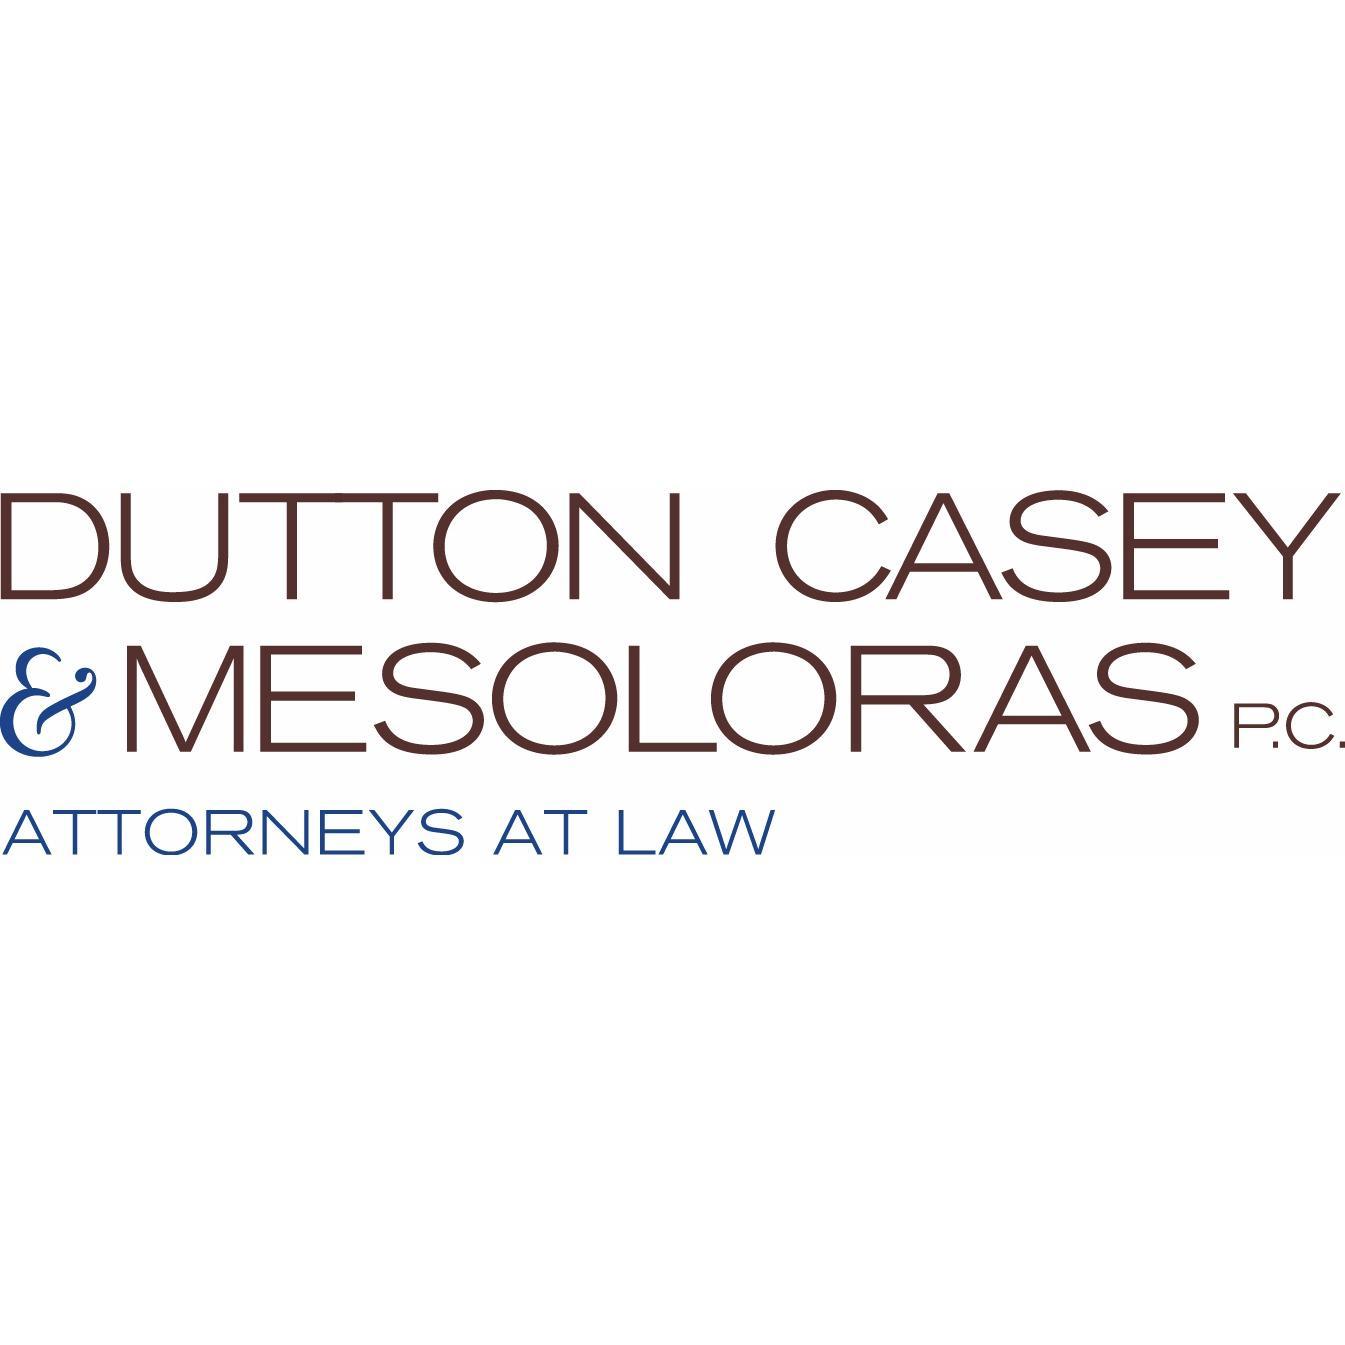 Dutton Casey & Mesoloras, Attorneys at Law (Elder Law I Estate Planning I Guardianship I Probate)